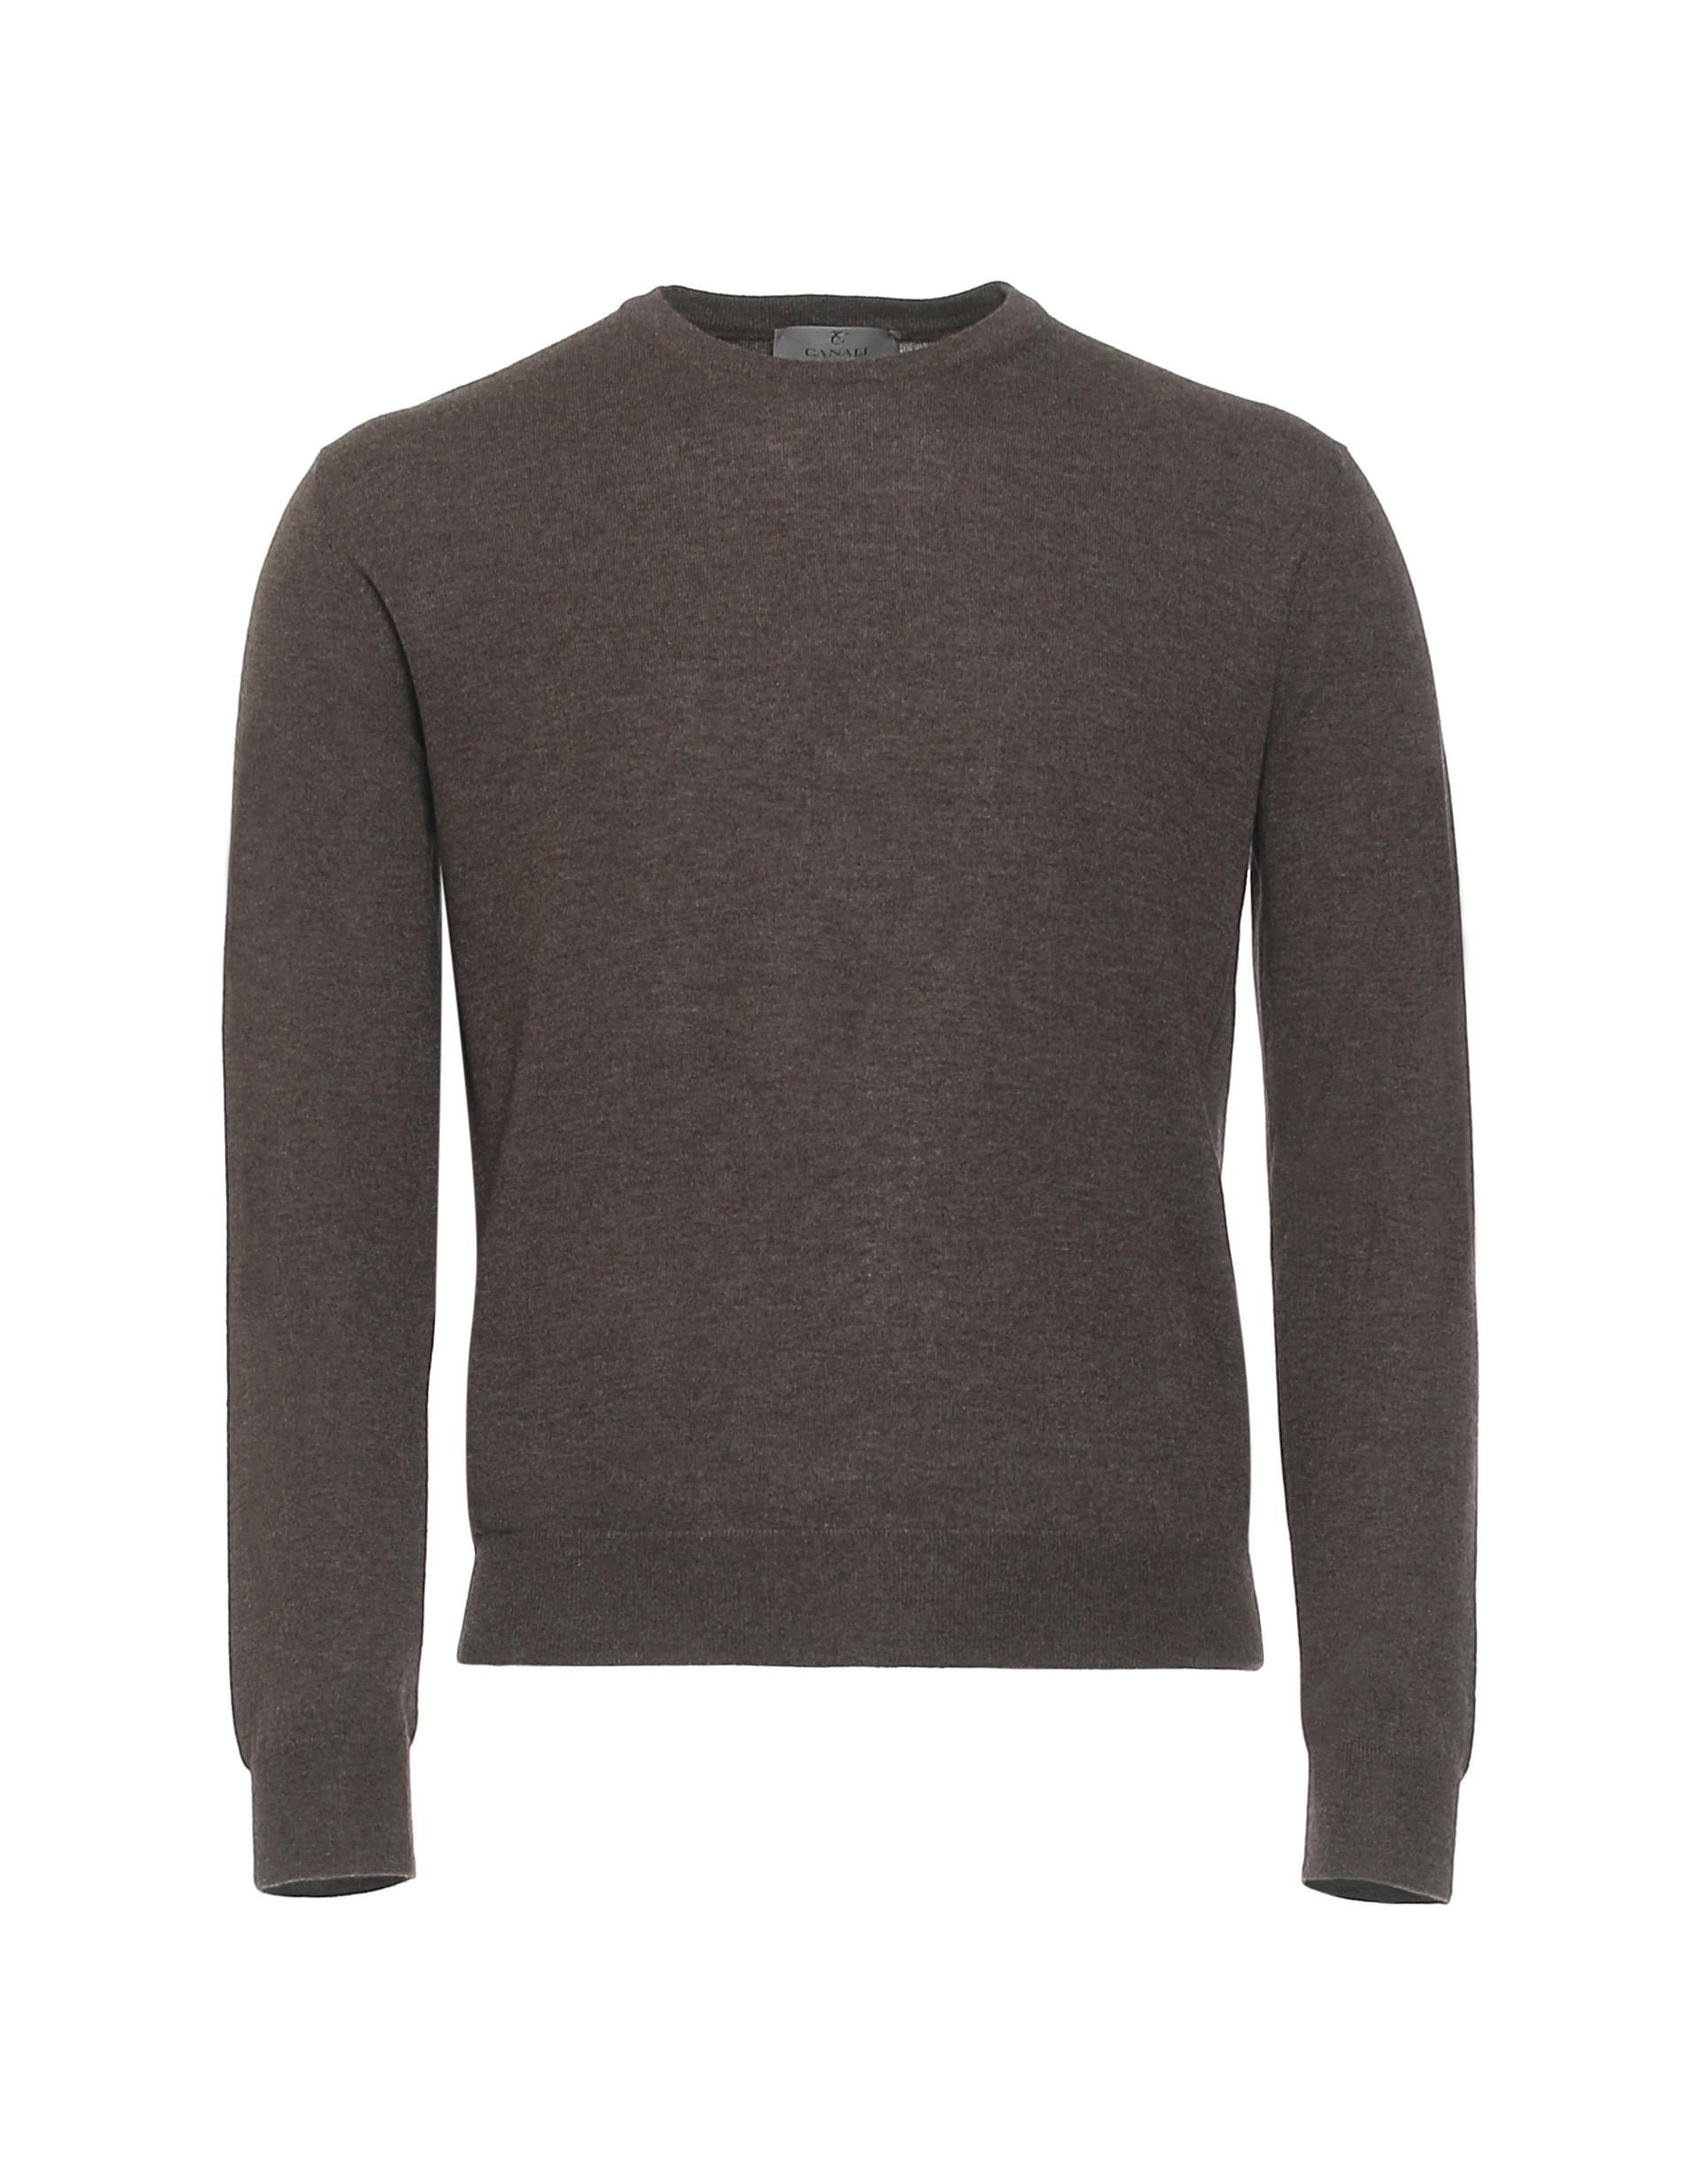 Canali Dark Brown Cashmere Crew Neck Sweater in Brown for Men | Lyst